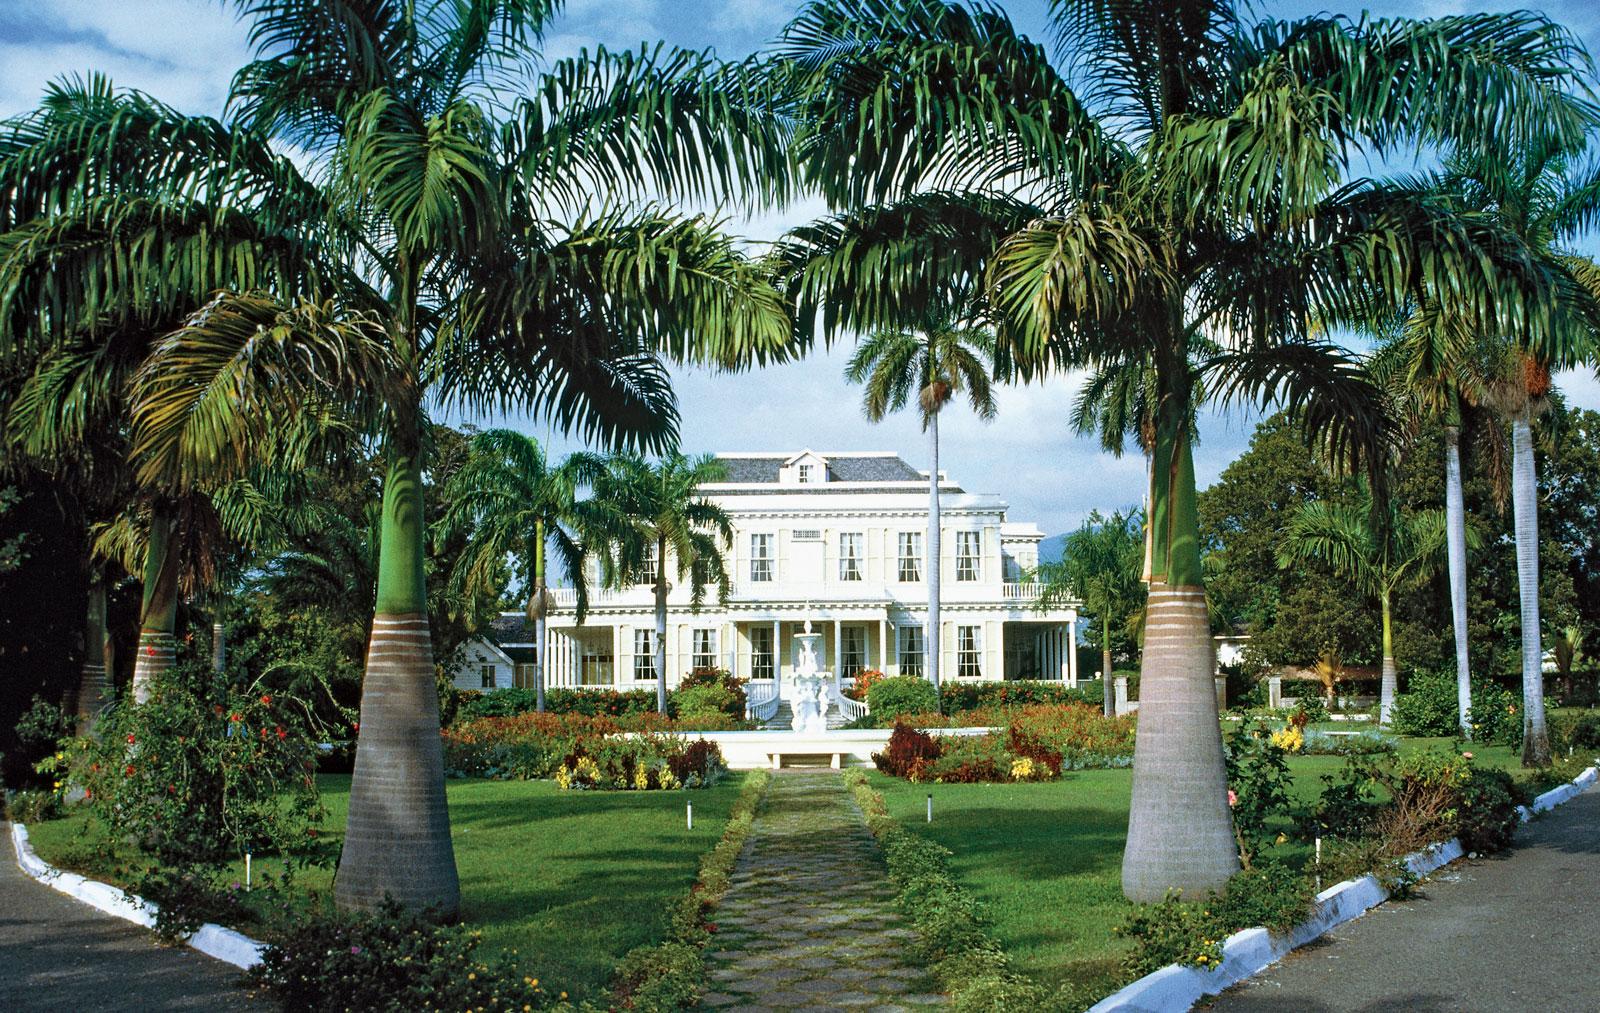 The-Devon-House-In-New-Kingston-Jamaica